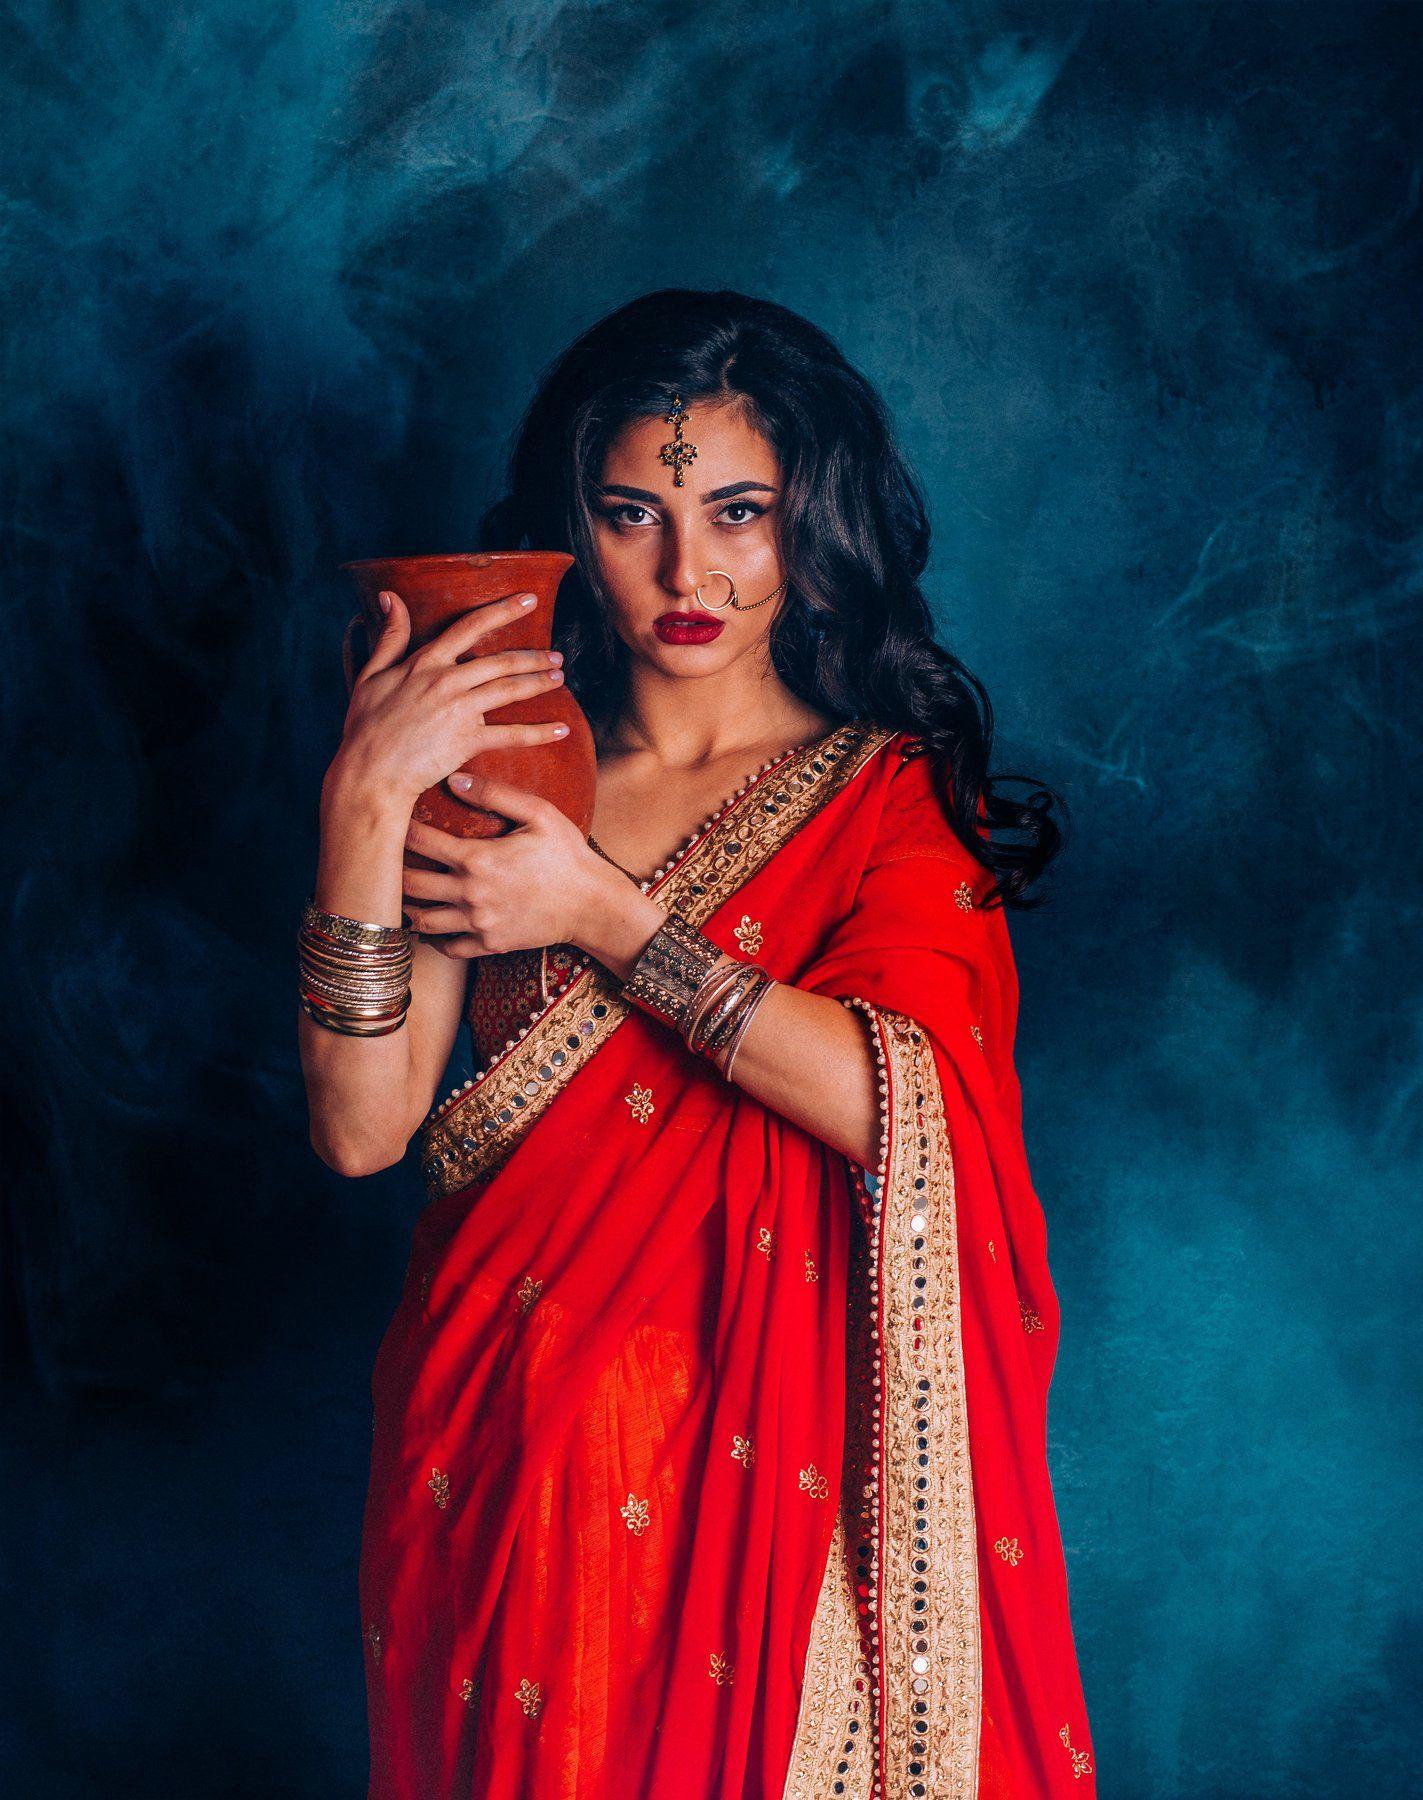 индианка, индия, индуска, сари,, красотка, портрет, брюнетка, Биличенко Оксана